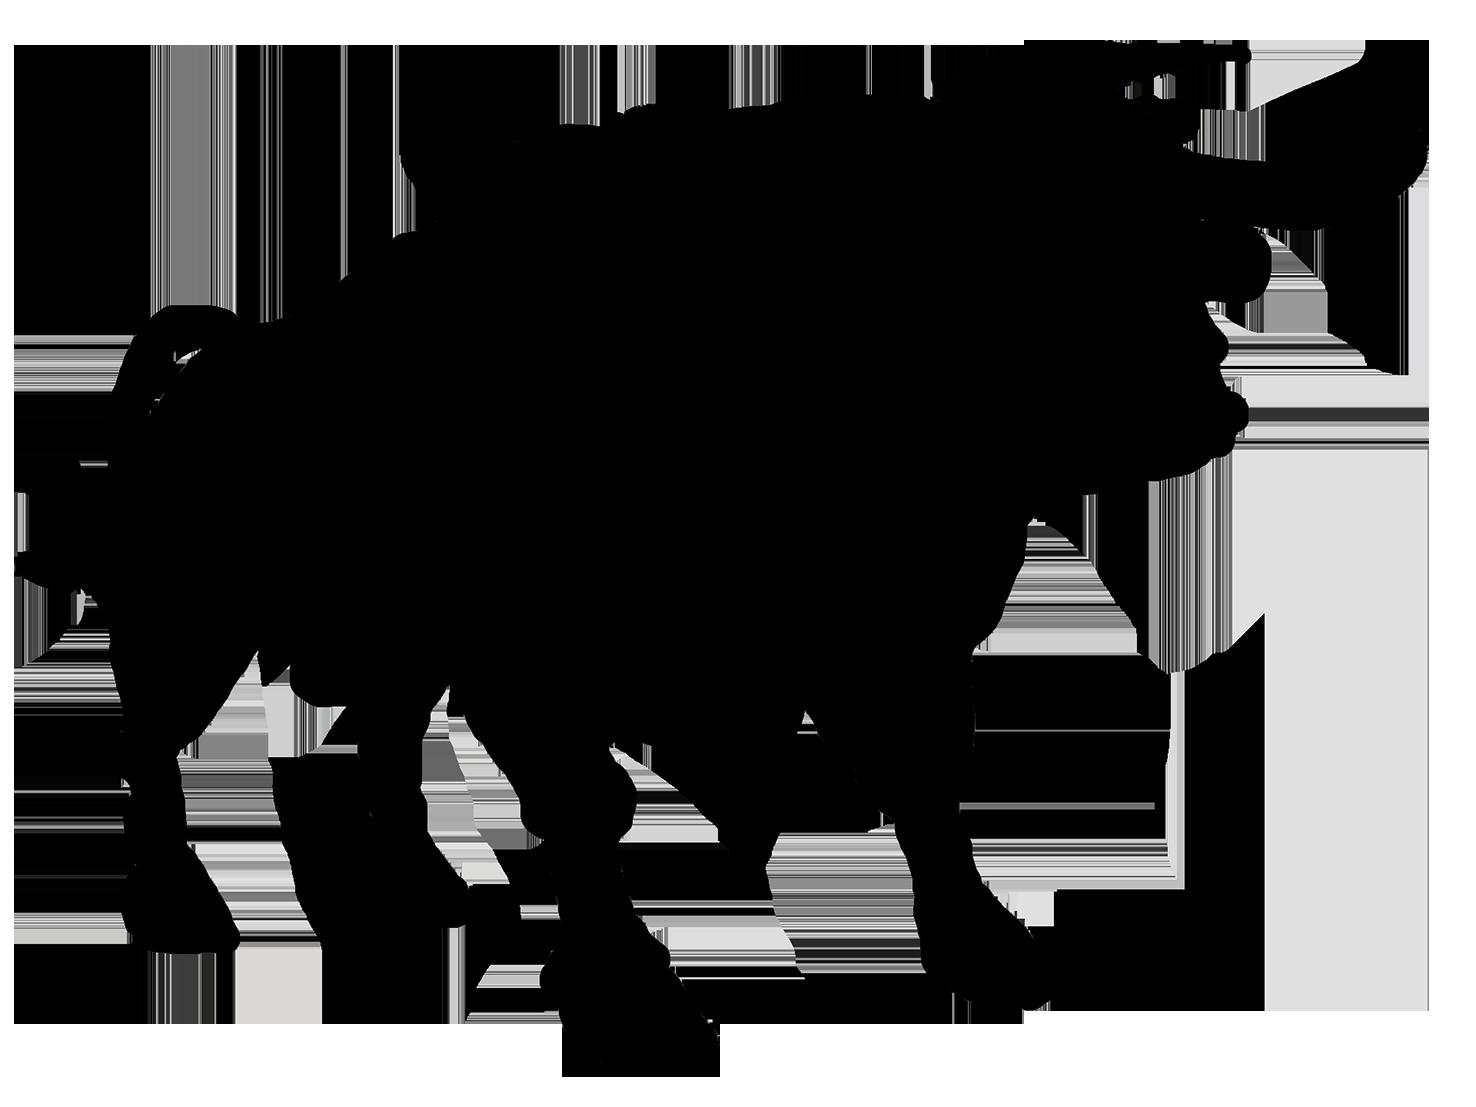 Bull silhouette png sert. Hawk clipart skyview